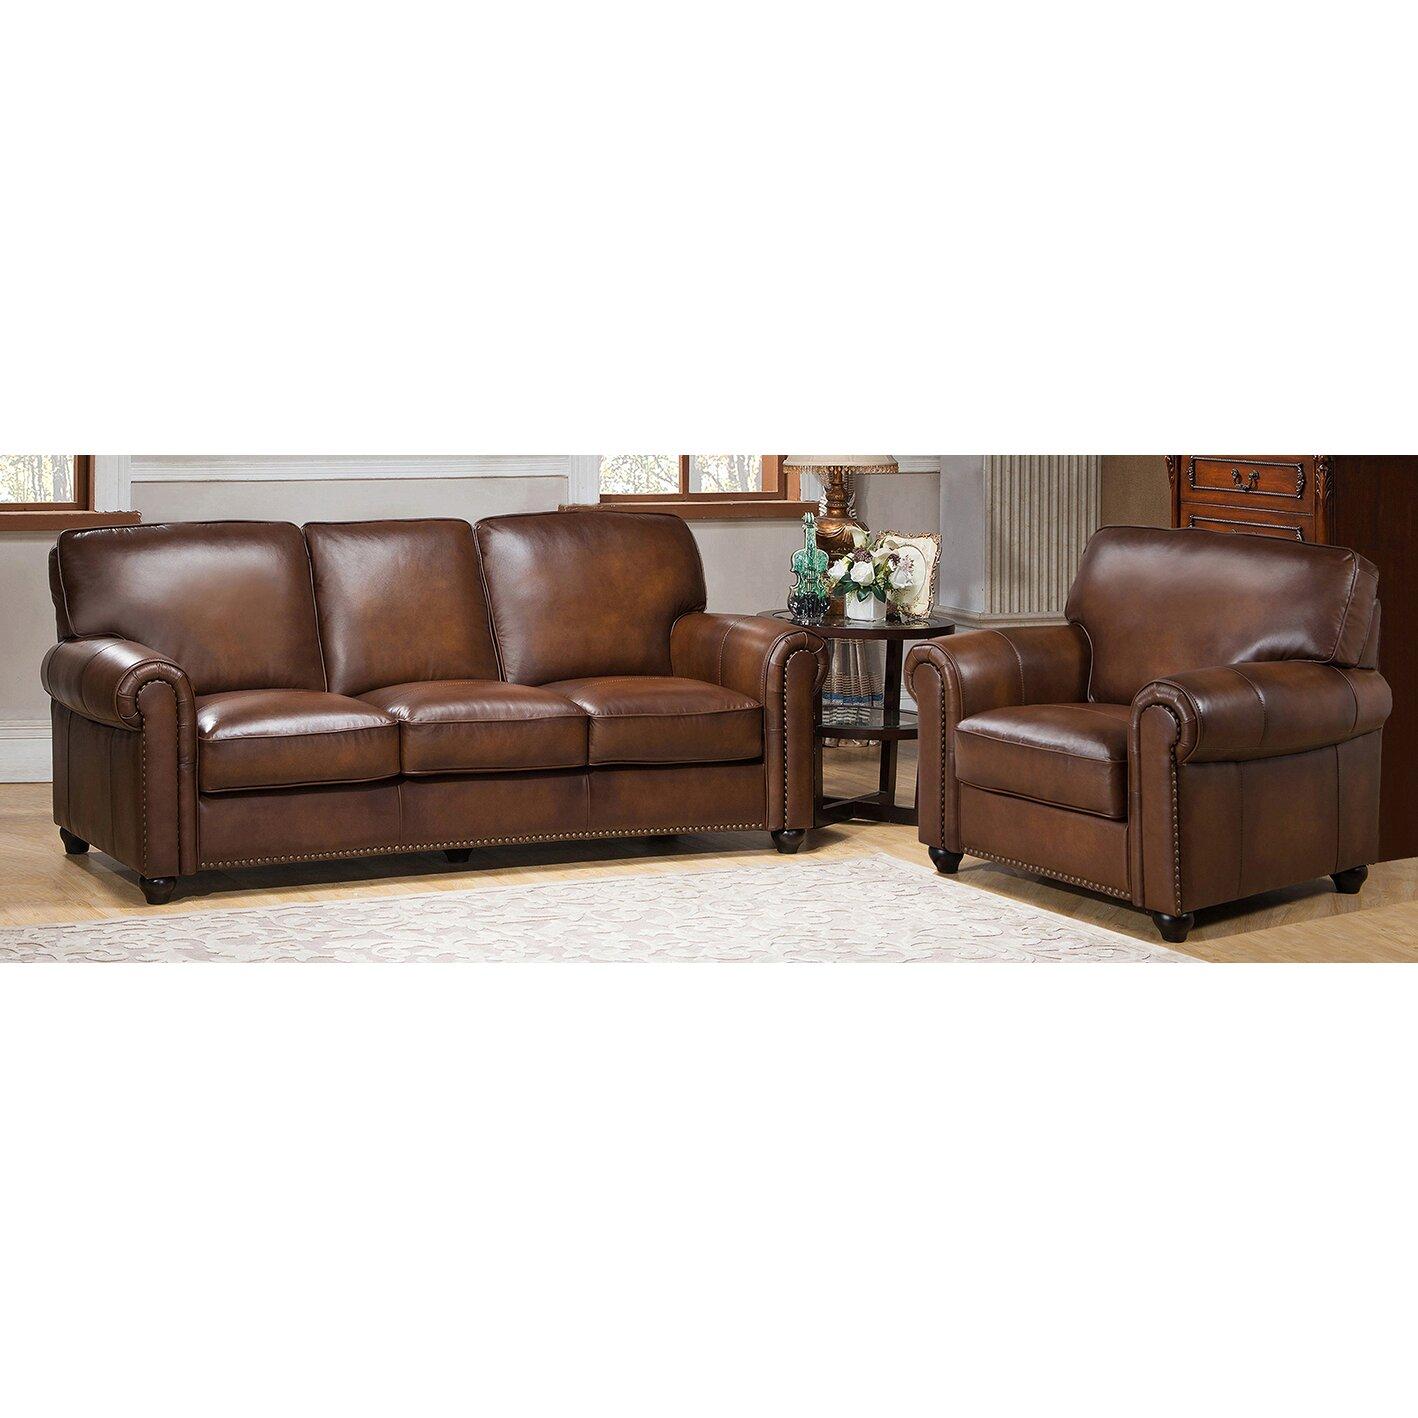 Leather Living Room Sets Amax Aspen 2 Piece Leather Living Room Set Wayfair